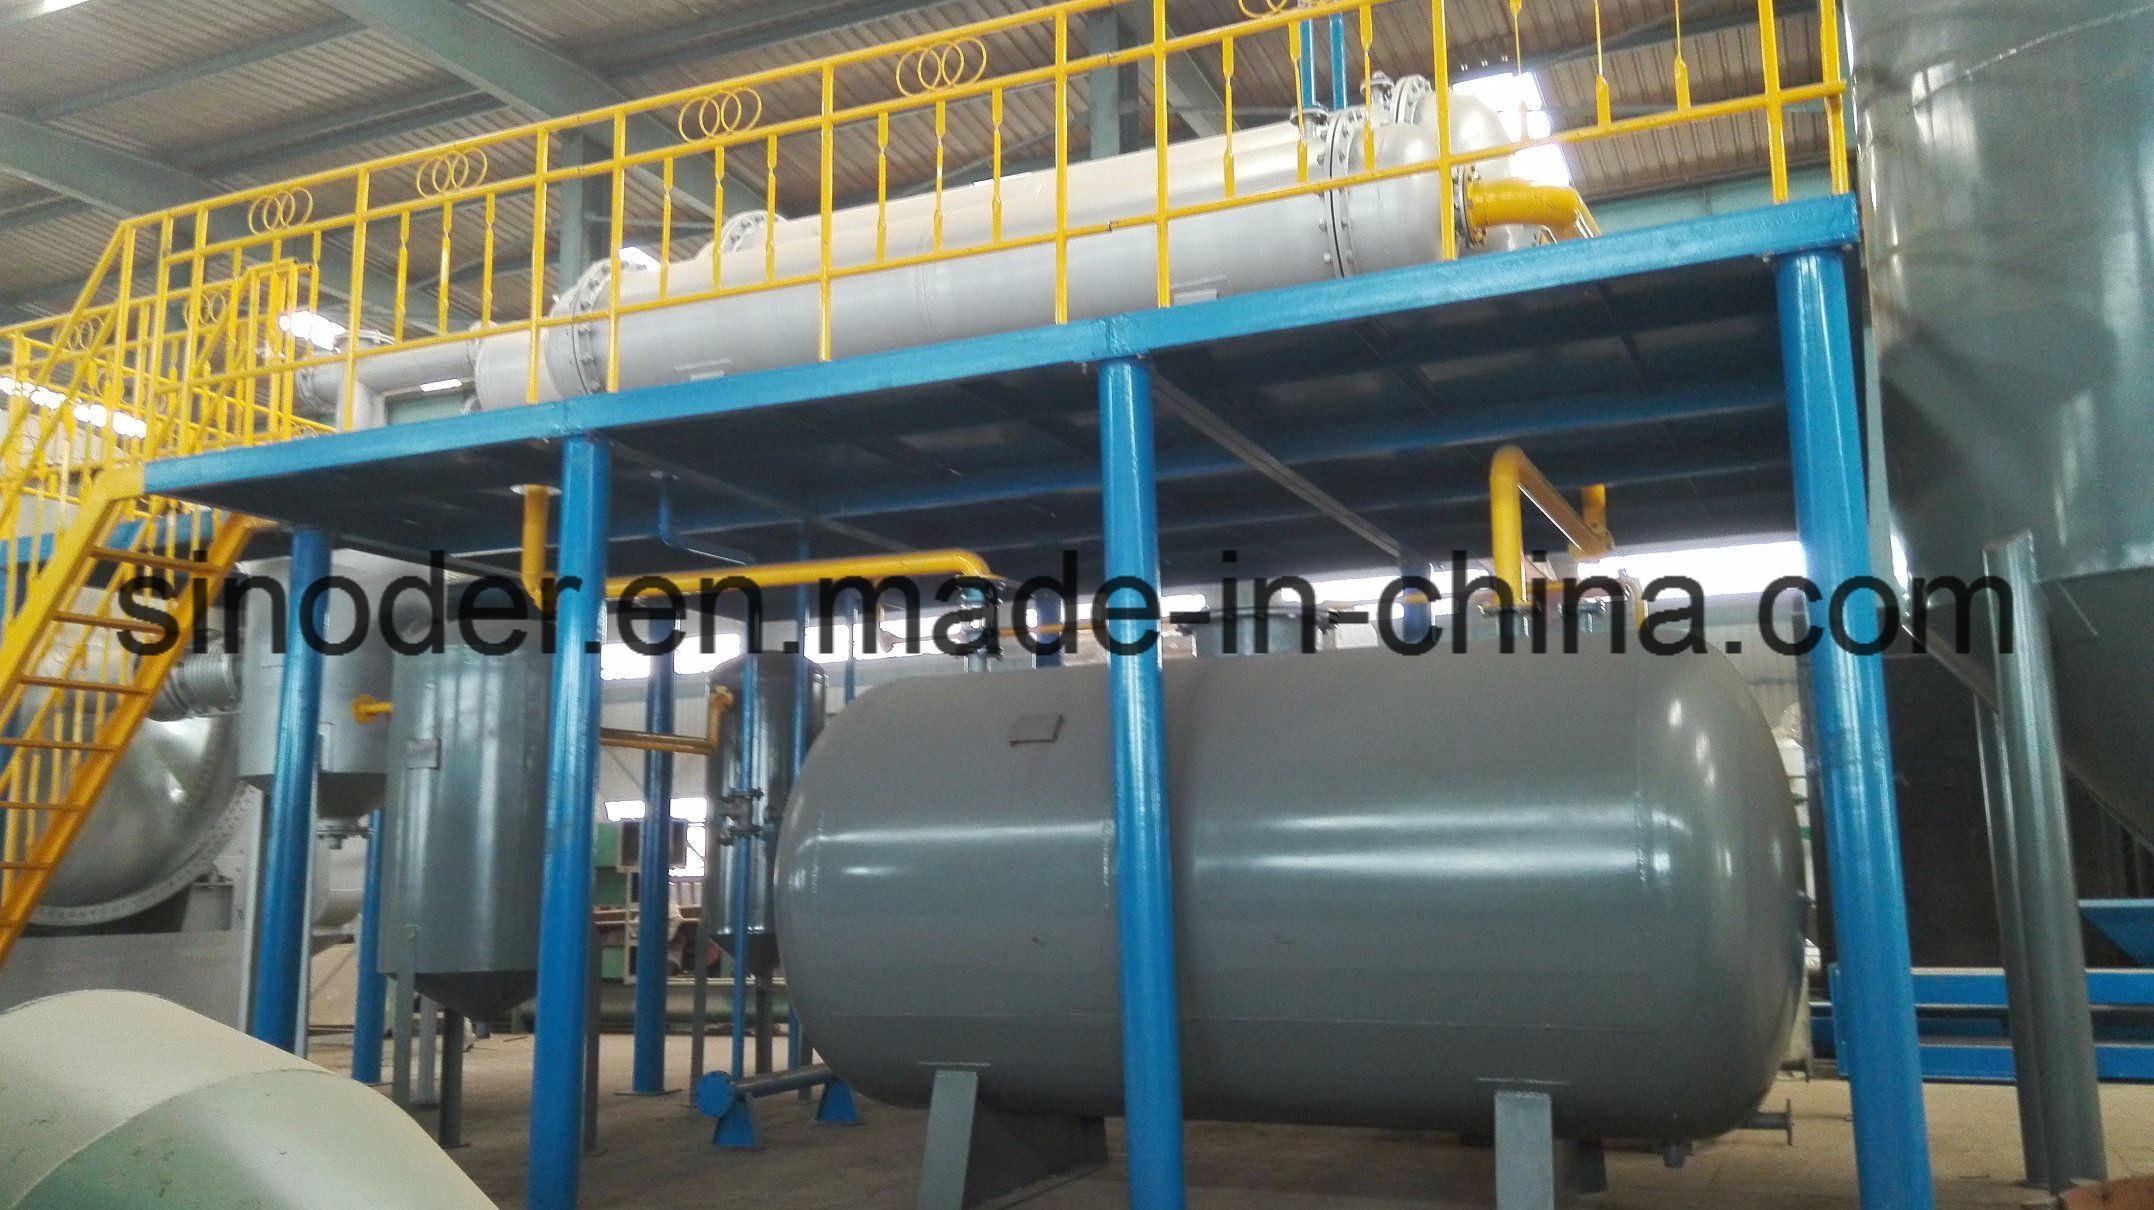 [Hot Item] New Designed Fuel Oil Distillation System Tyre Oil Refinery  Machine to Diesel Plastic Oil Distillation Plant